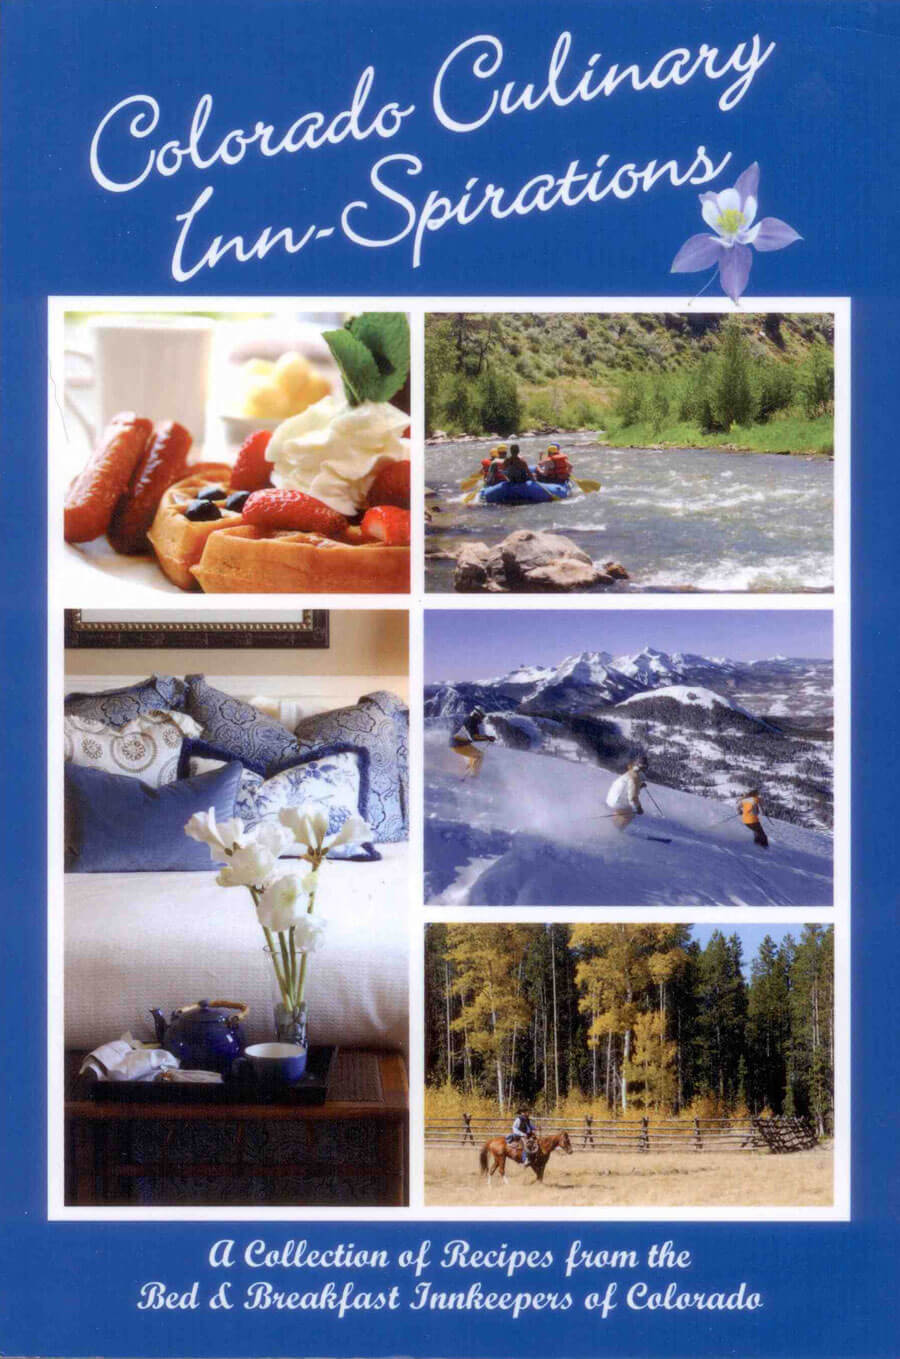 Cookbook - Bed & breakfasts & inns of Colorado Association